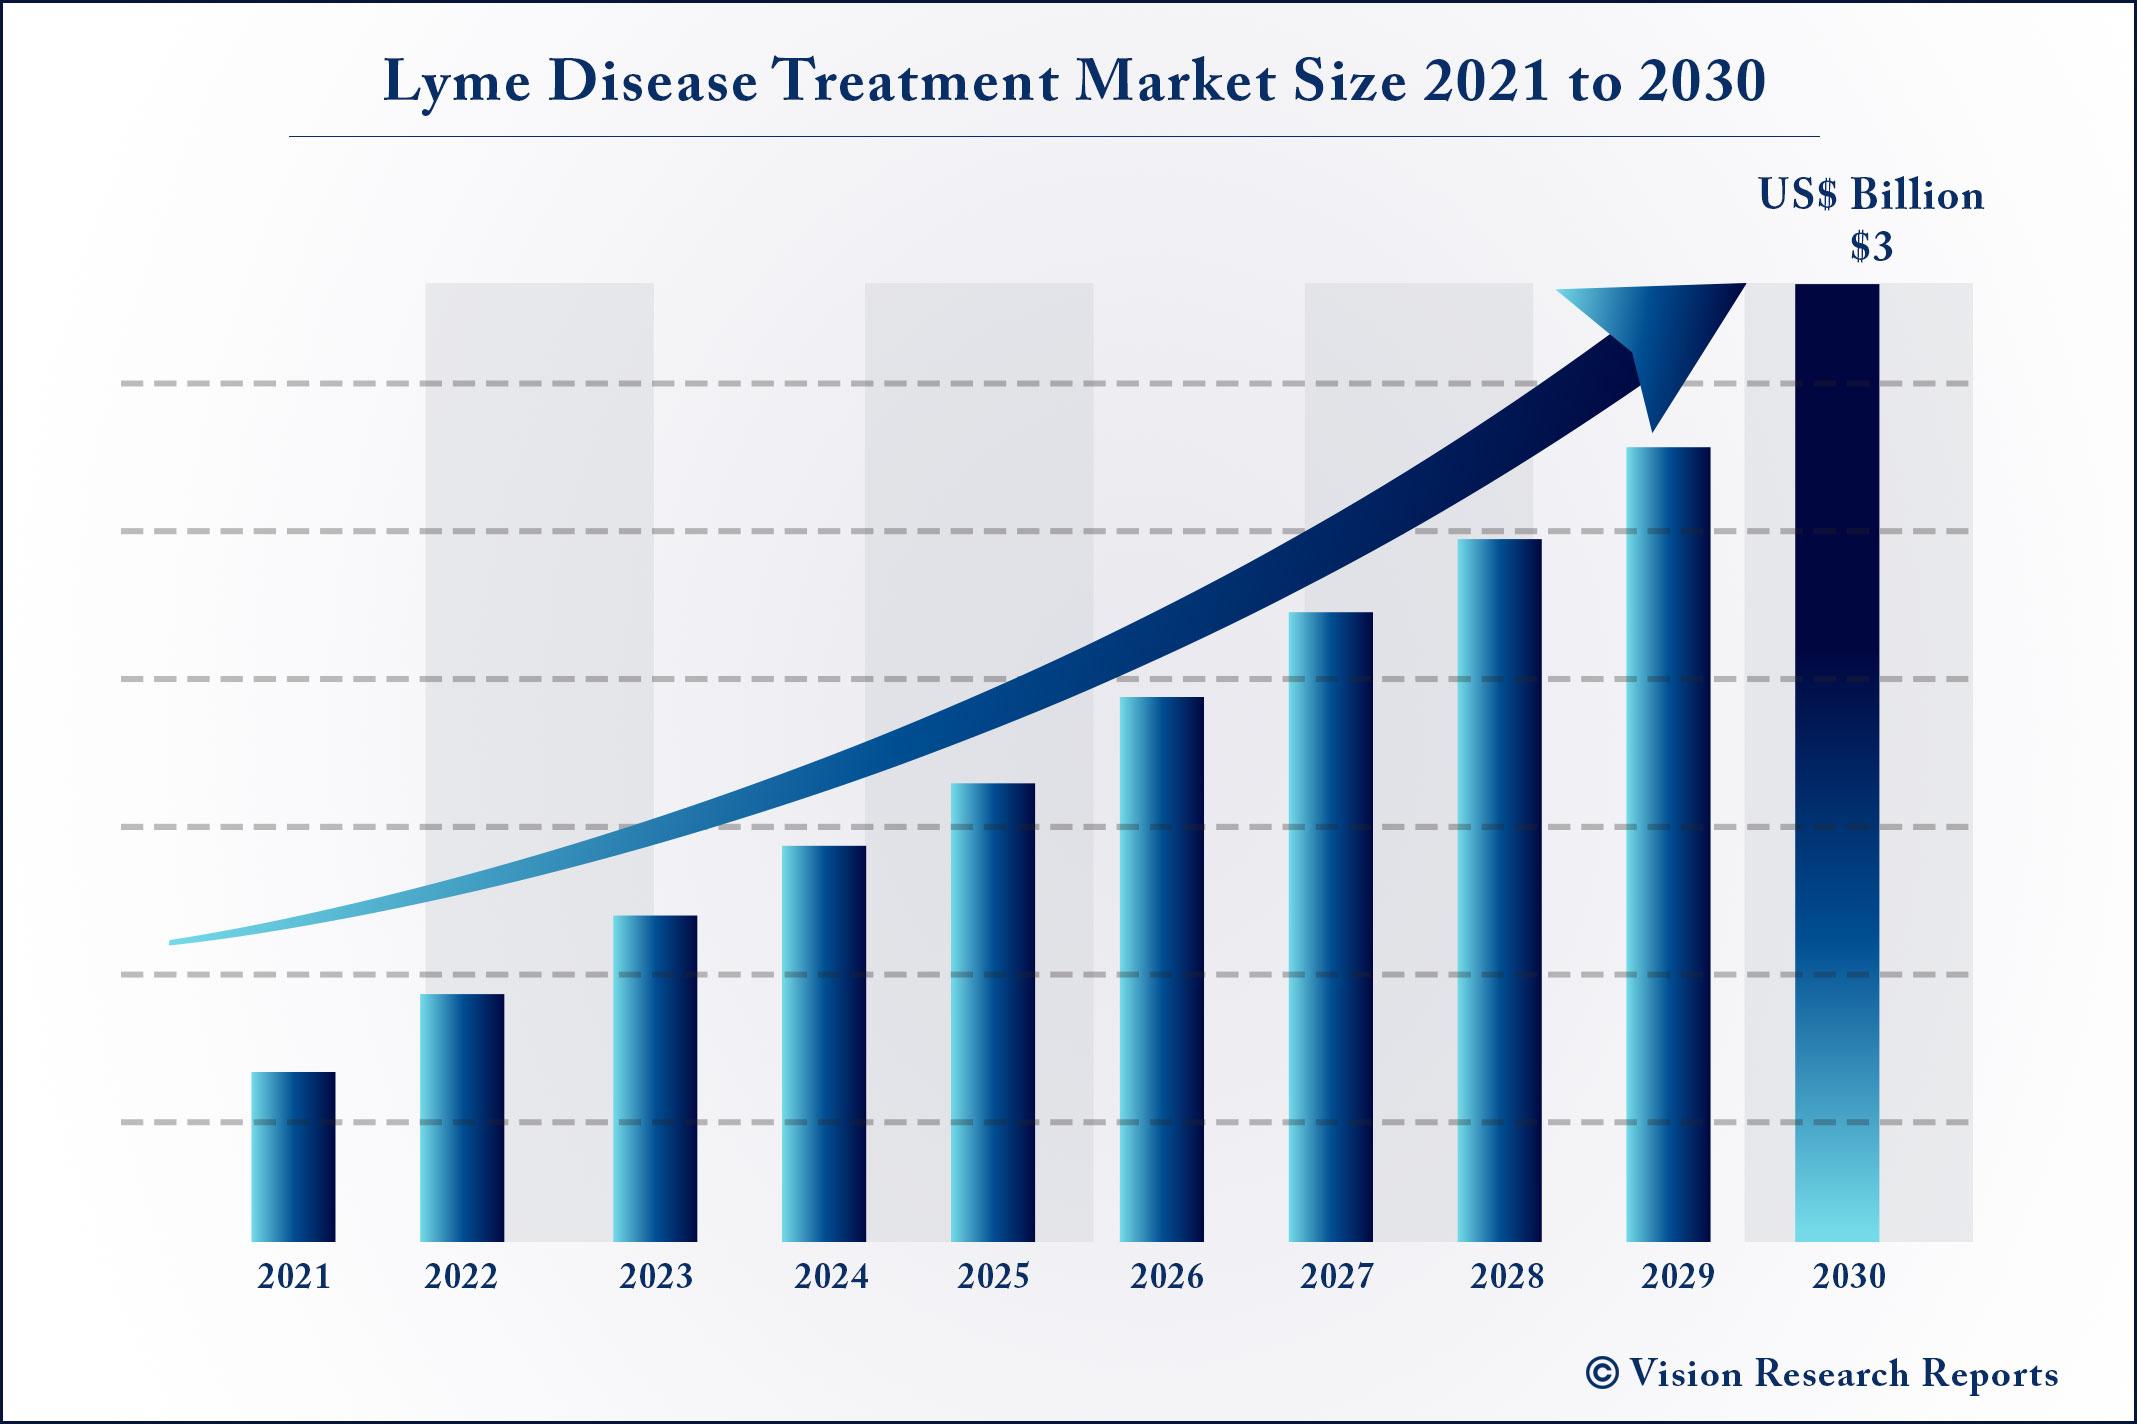 Lyme Disease Treatment Market Size 2021 to 2030